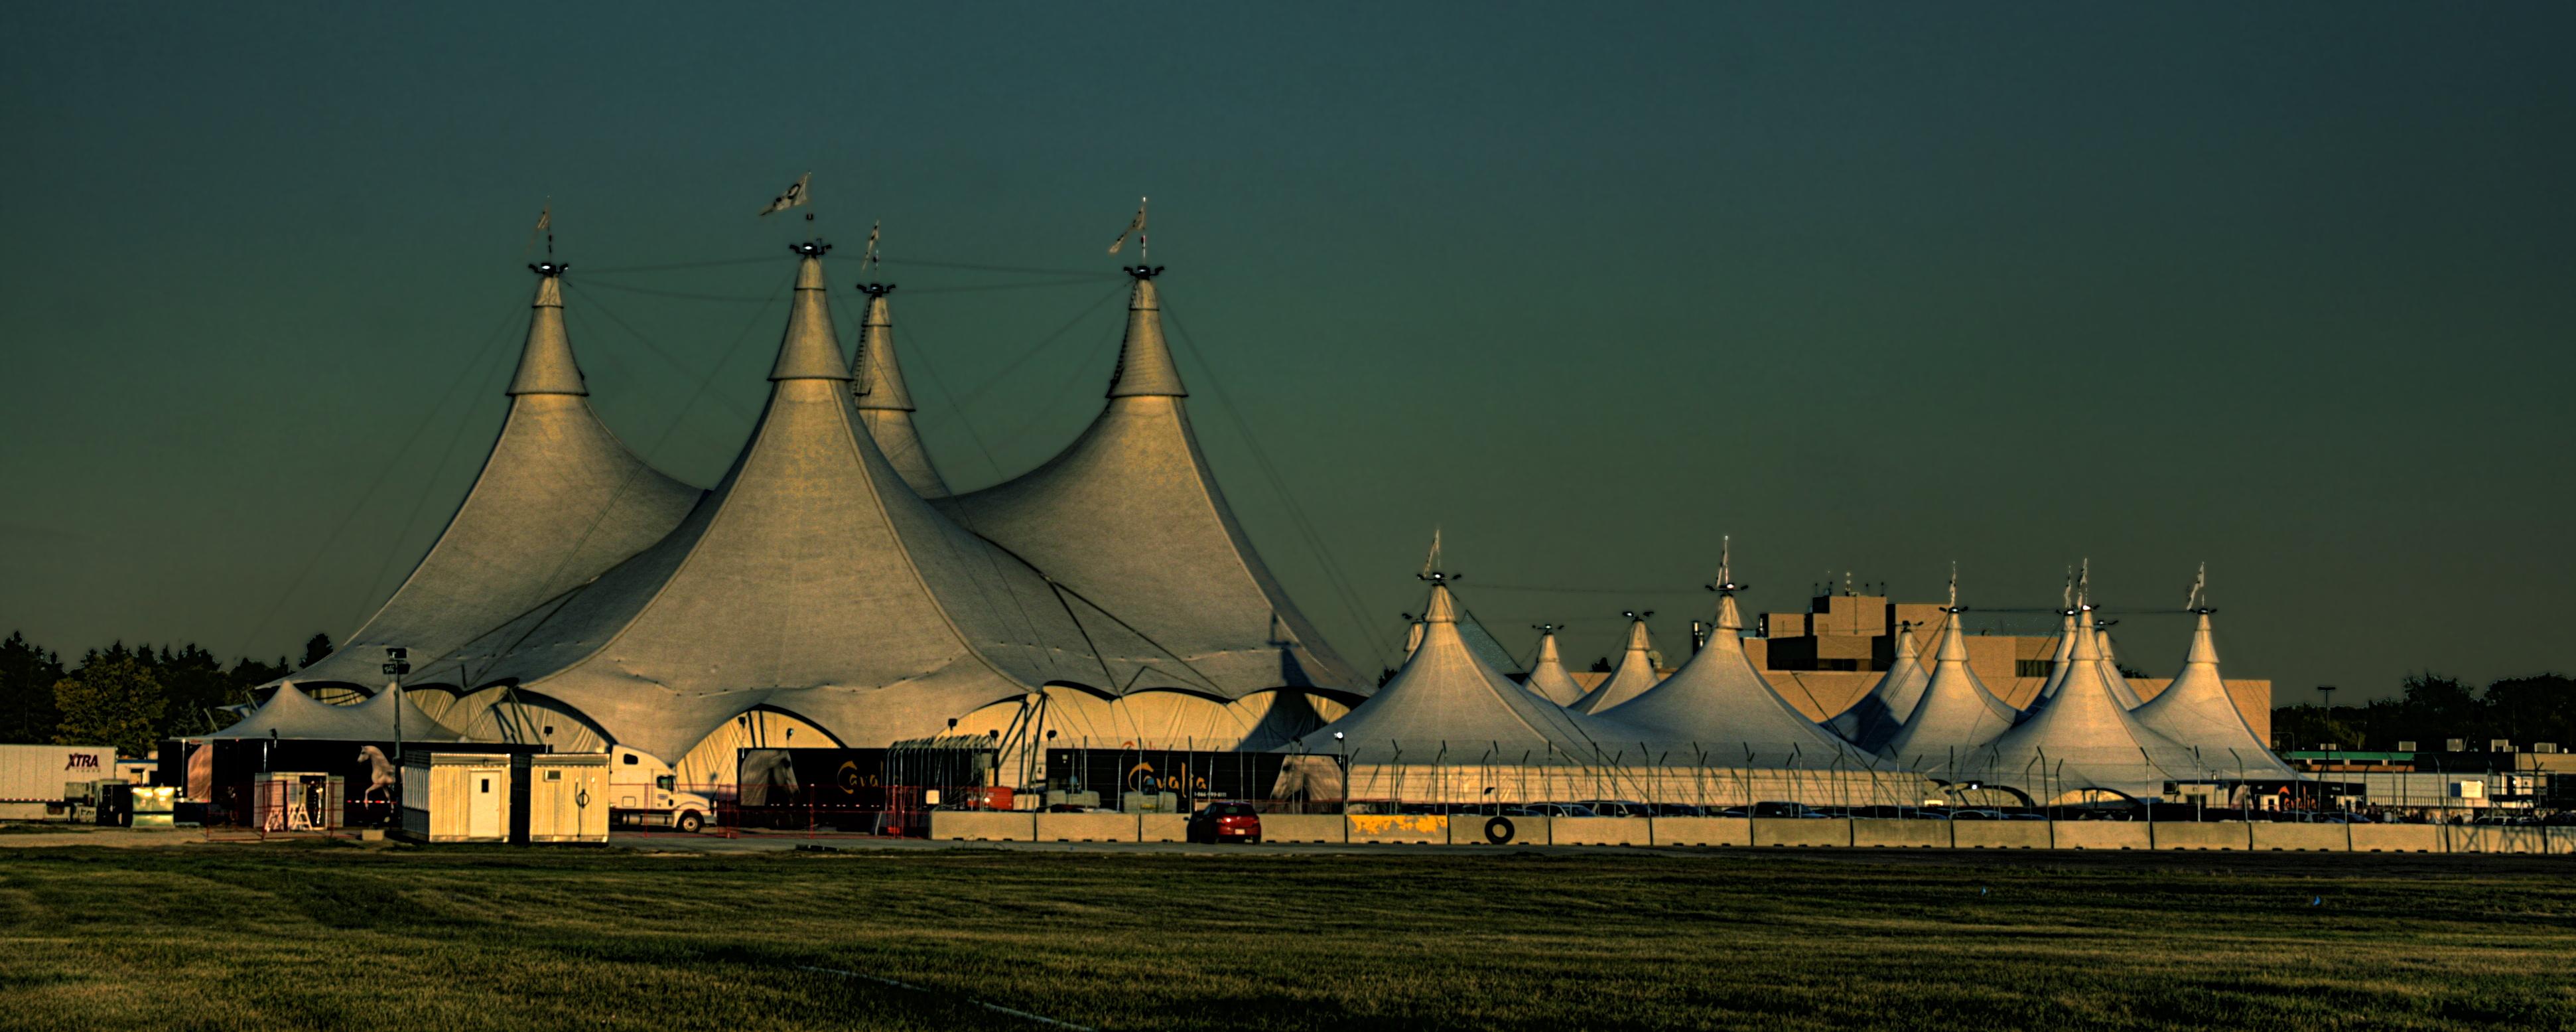 FileCavalia-Tents-Edmonton-Alberta-Canada-01A.jpg & File:Cavalia-Tents-Edmonton-Alberta-Canada-01A.jpg - Wikimedia Commons